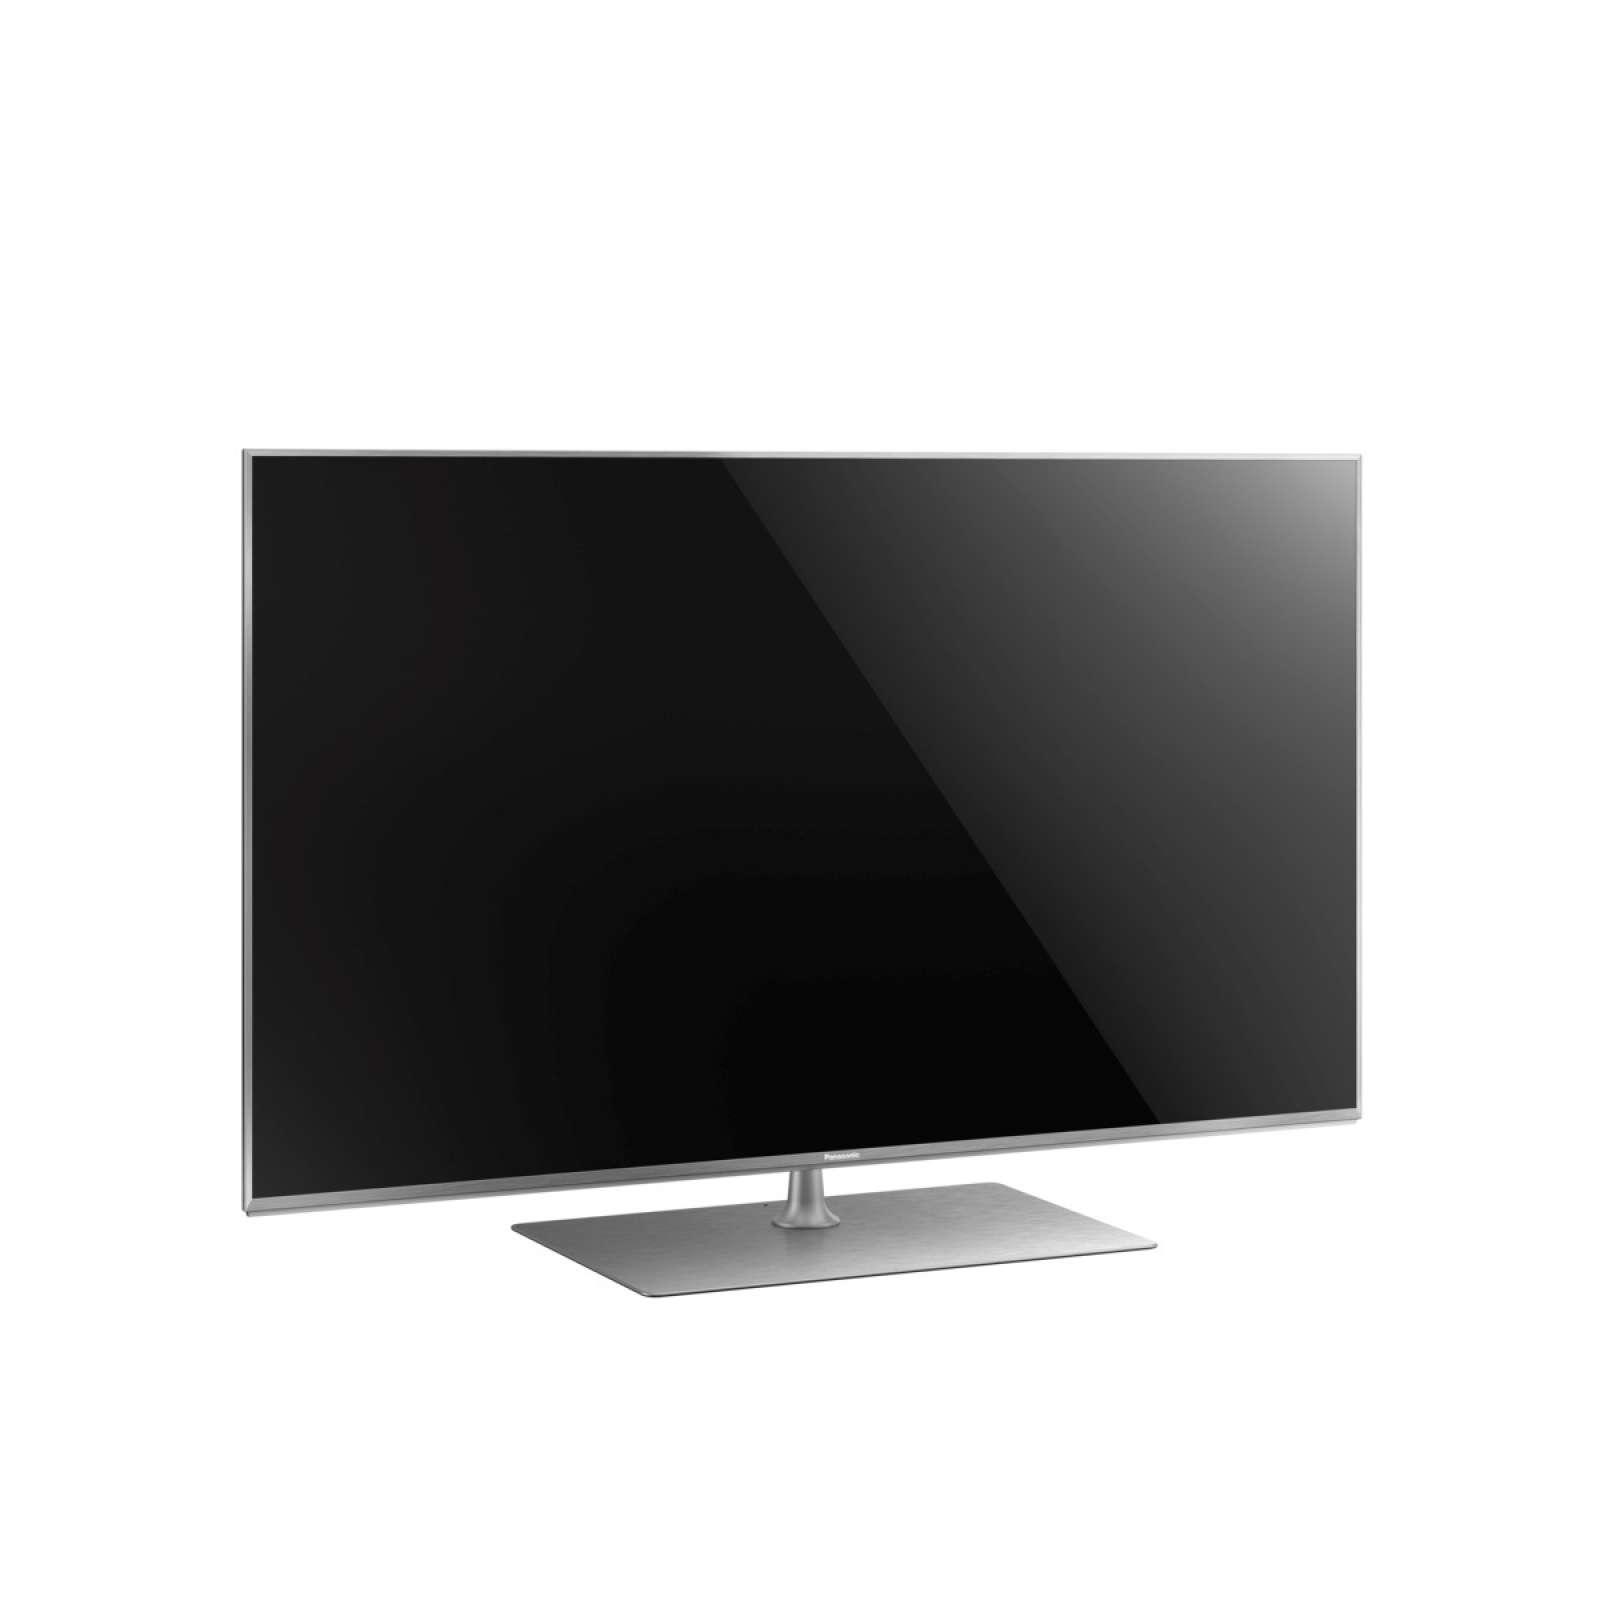 panasonic tx 65ext786 si led tv uhd elektro risch. Black Bedroom Furniture Sets. Home Design Ideas